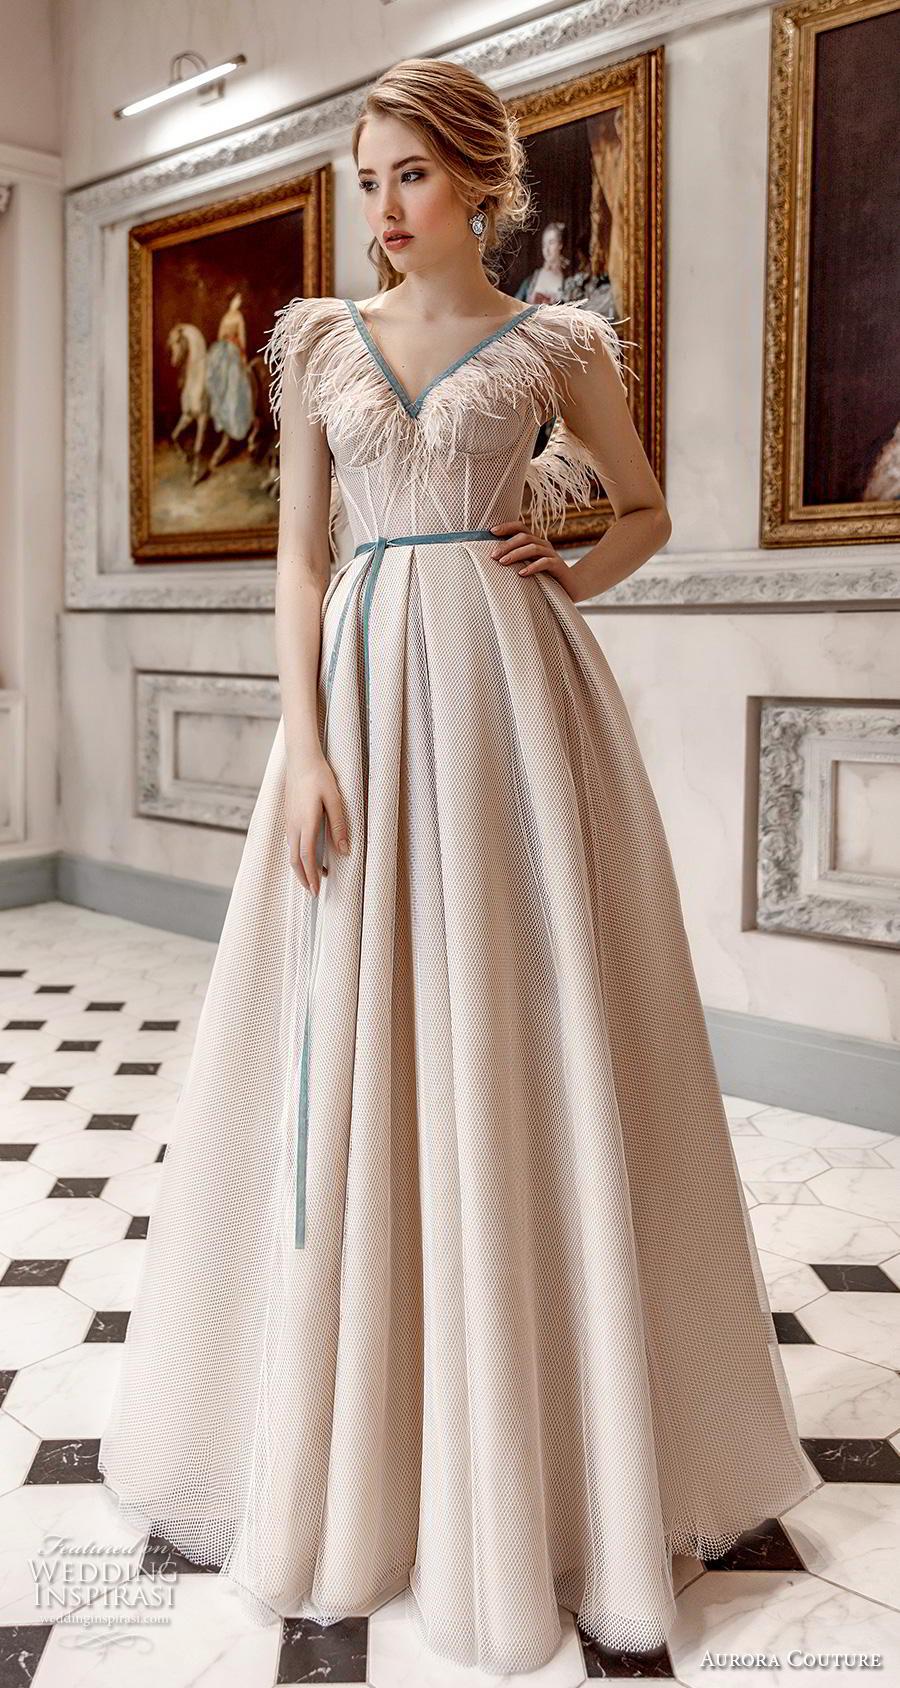 aurora couture 2019 bridal cap sleeves fringe v neck bustier simple romantic ivory a  line wedding dress (16) mv